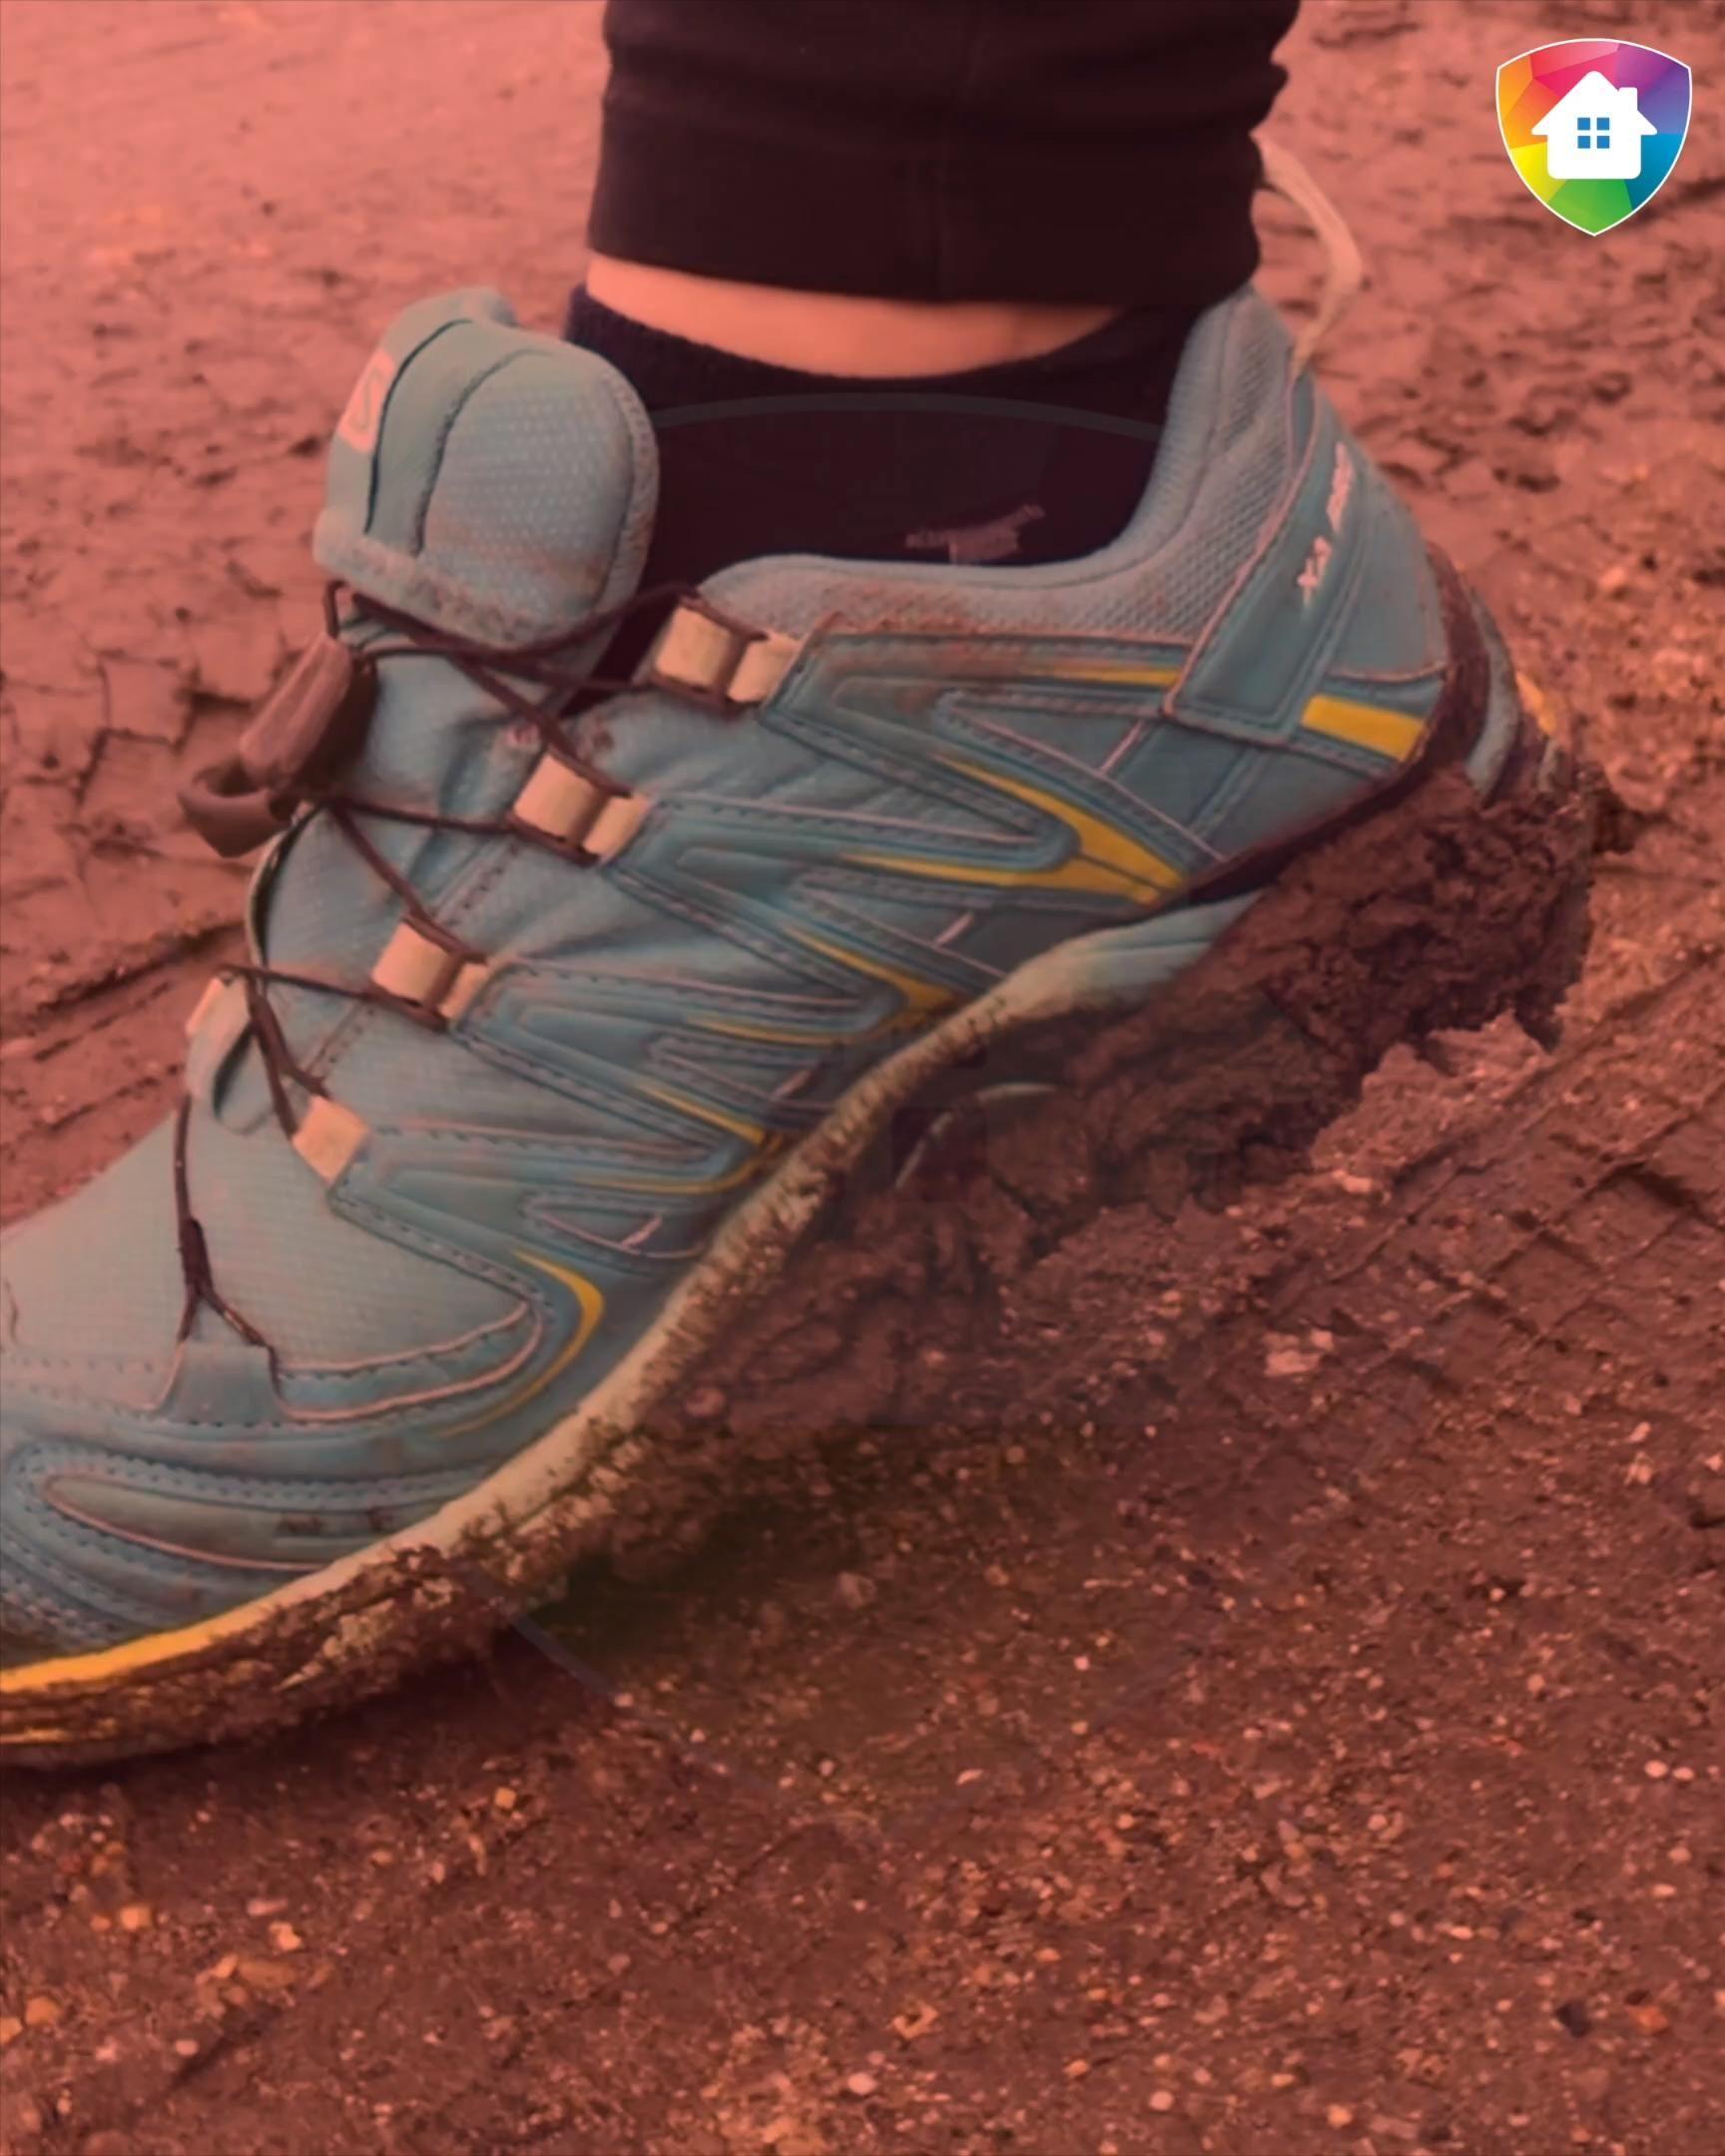 Ochraniacze Na Buty Video In 2020 Boots Hiking Boots Shoes